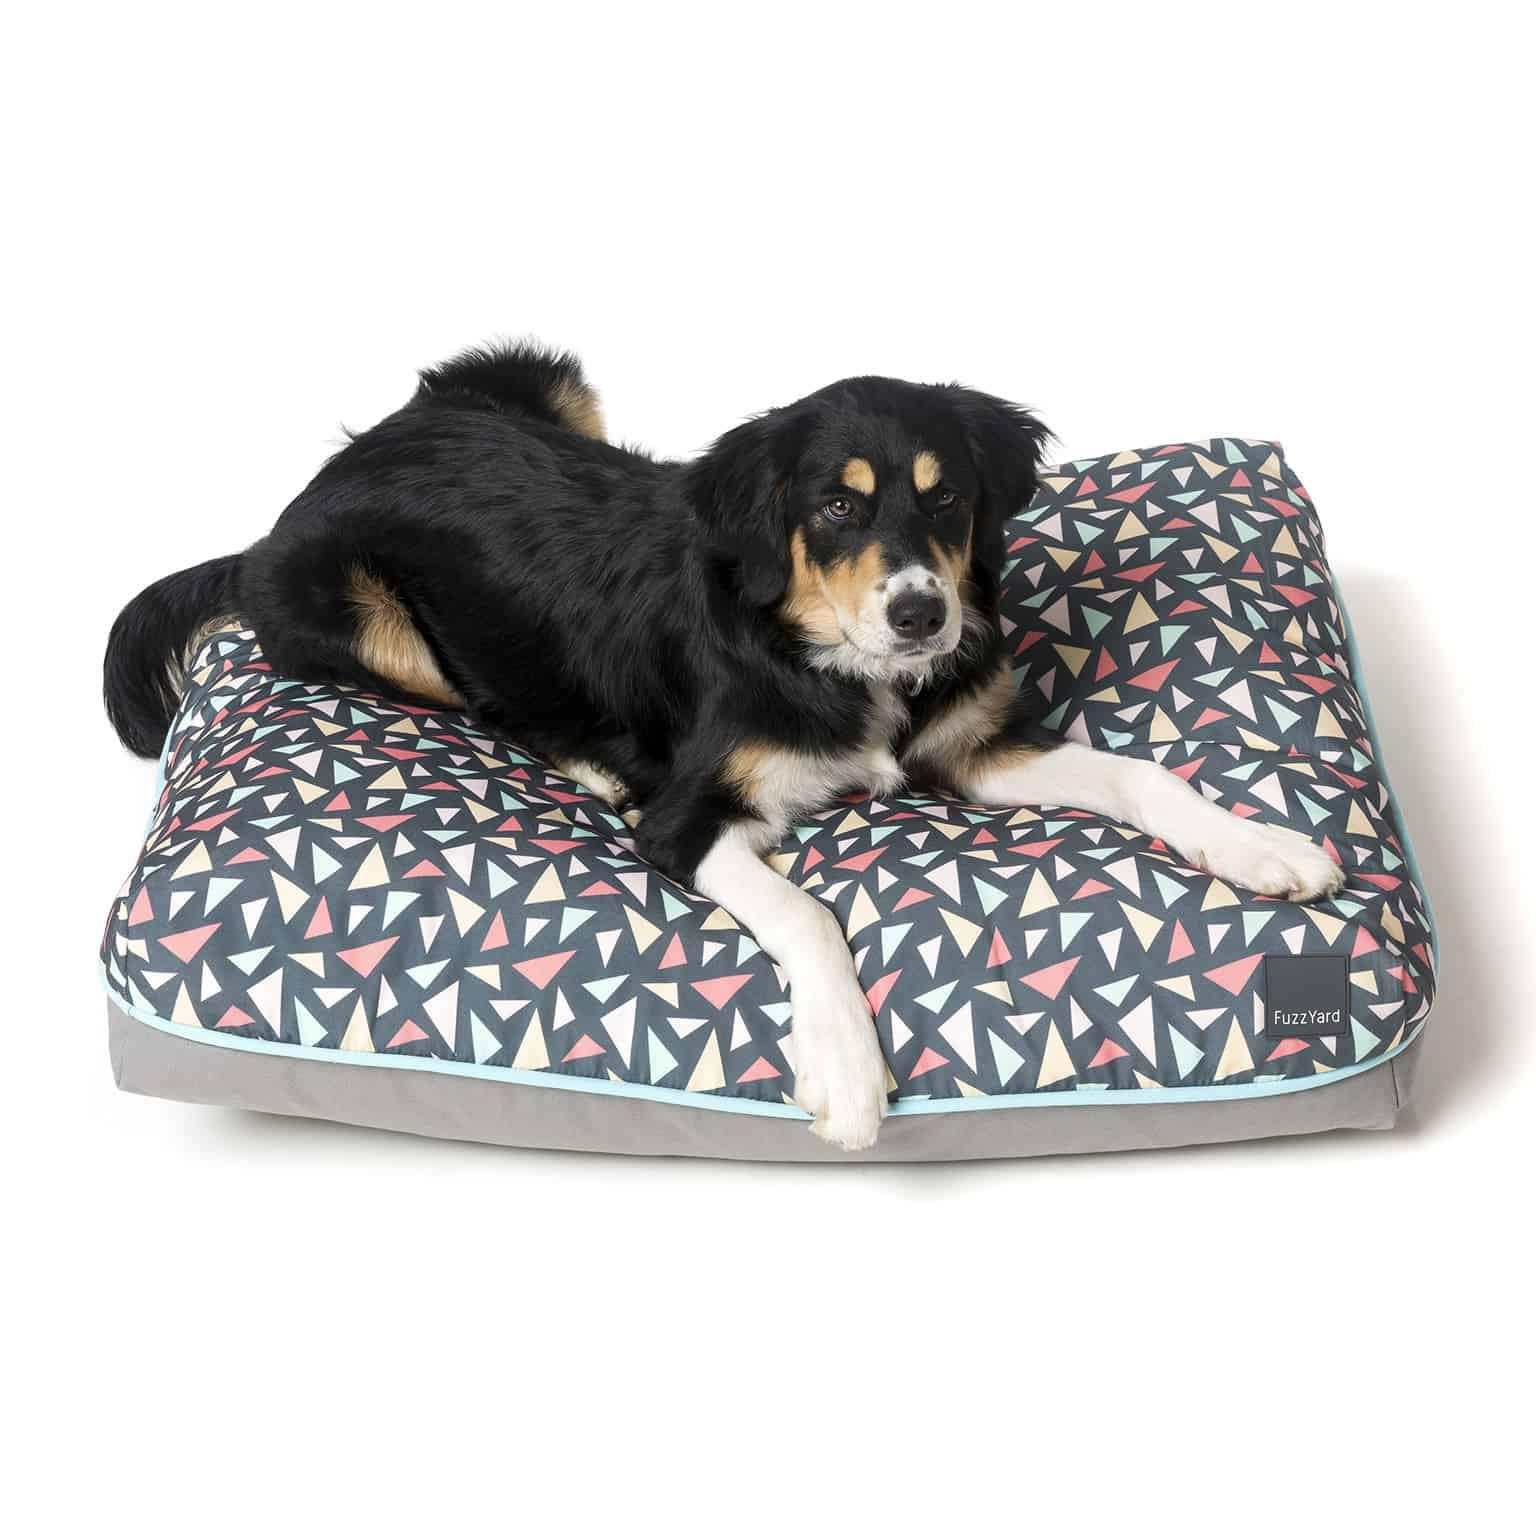 Fuzzyard Pillow Bed - Rad